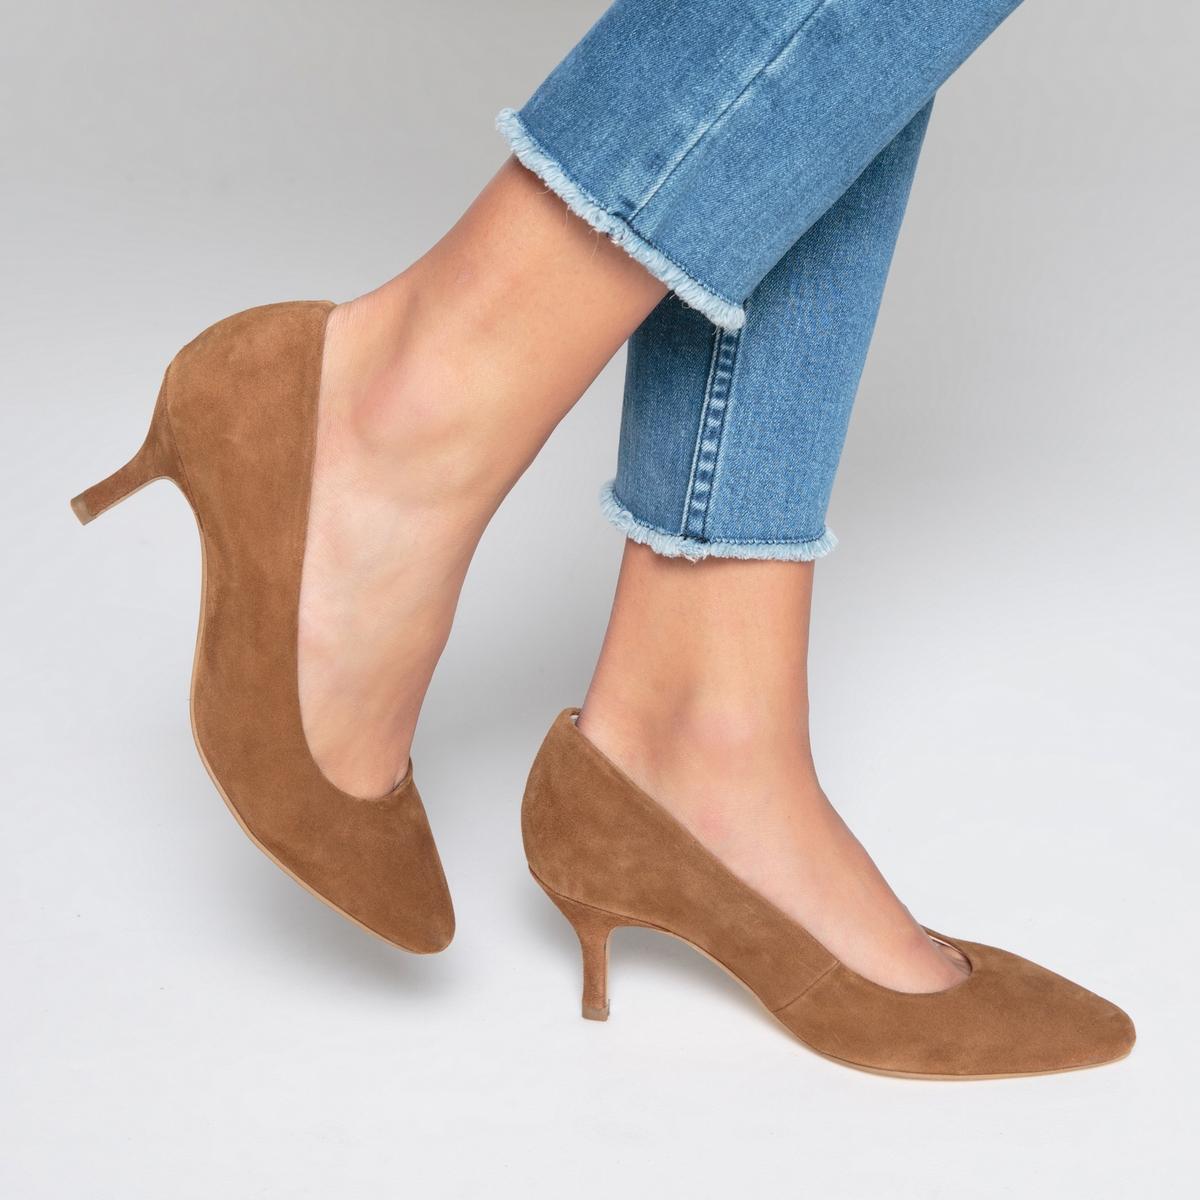 Туфли кожаные на среднем каблуке туфли la strada туфли на каблуке